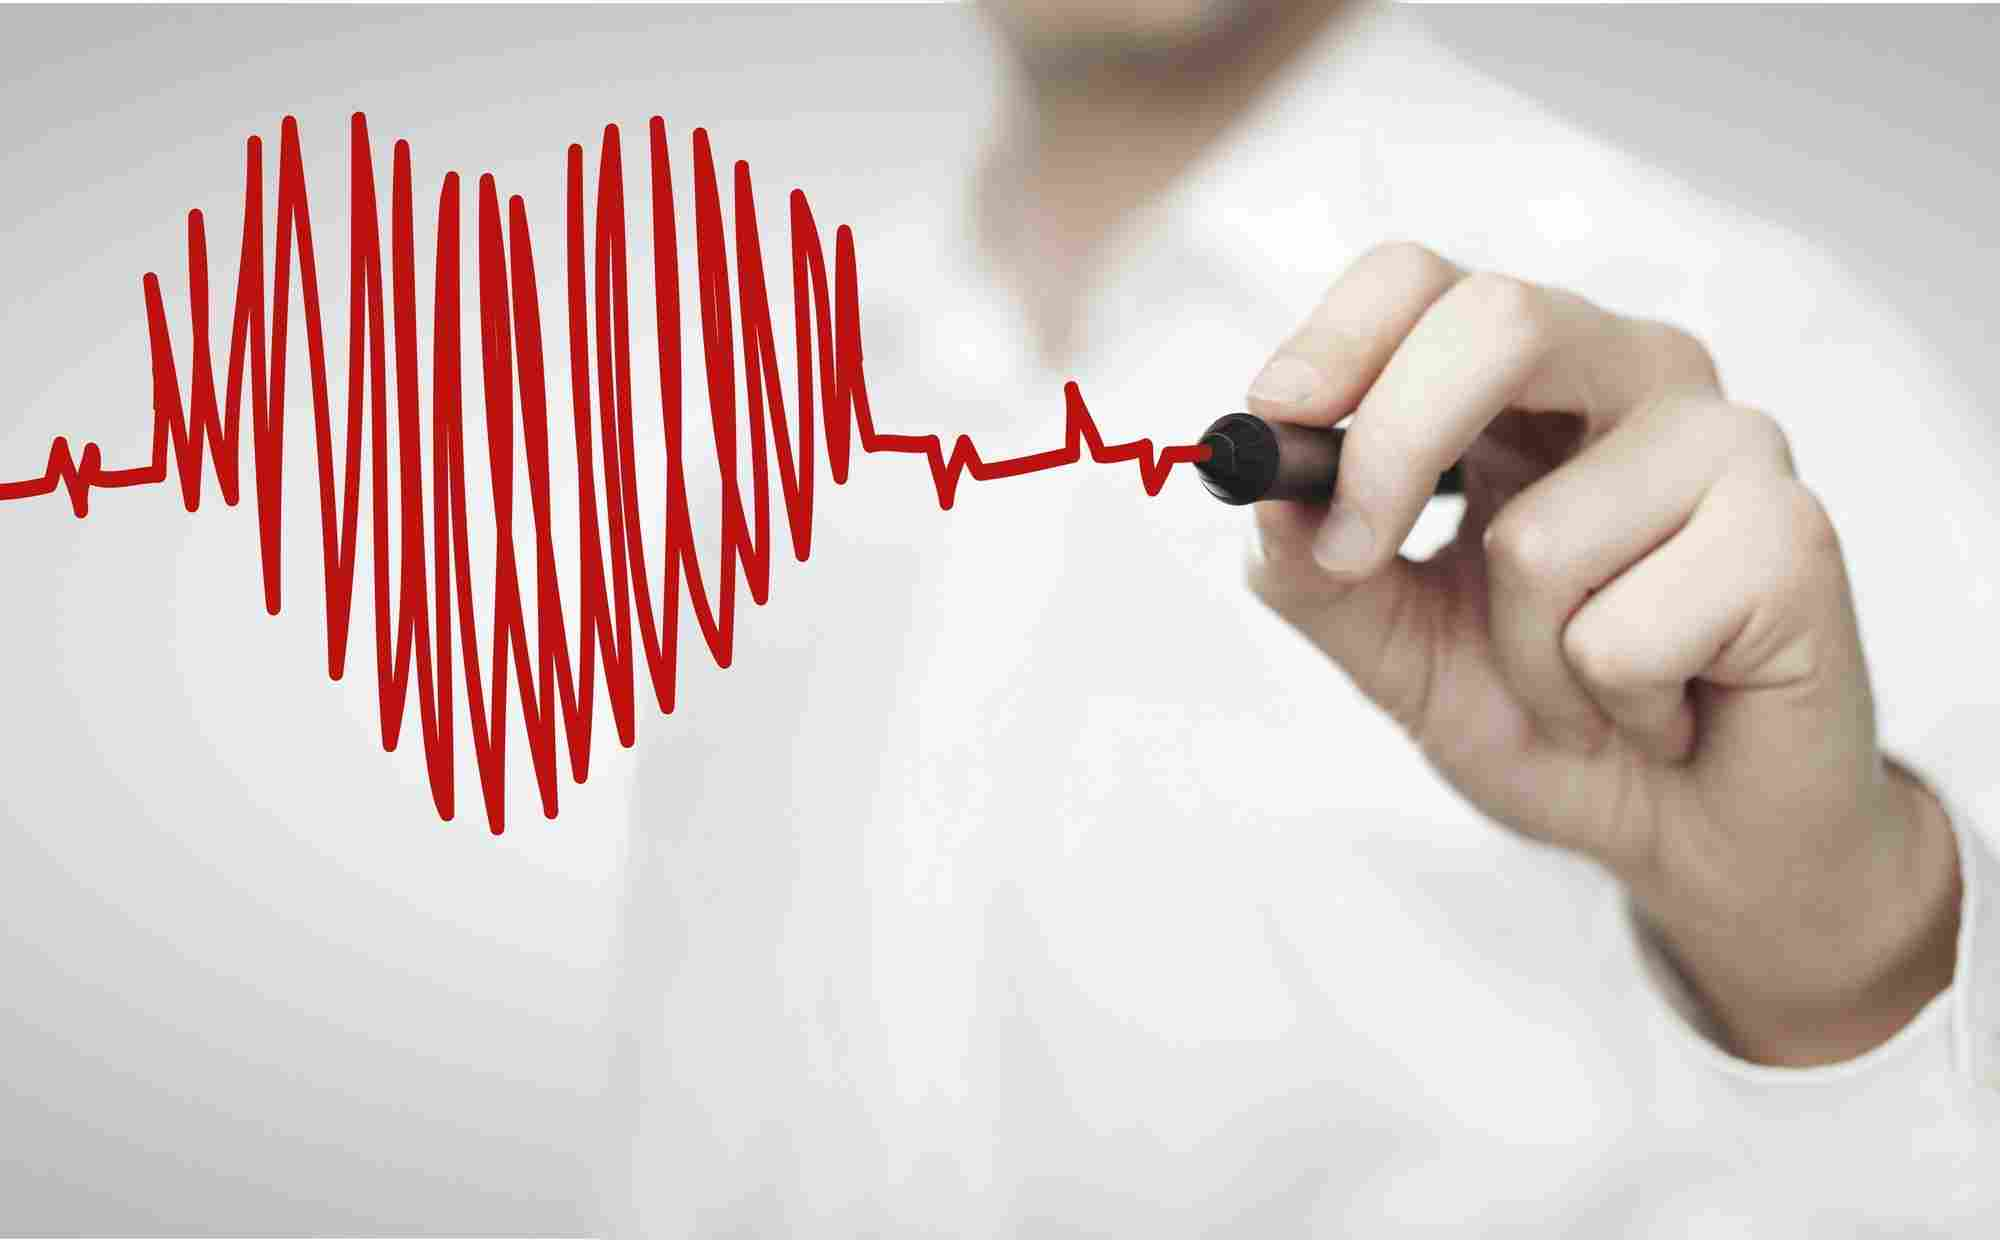 https://www.michelefalco.eu/wp-content/uploads/2015/12/heart-health-1.jpg